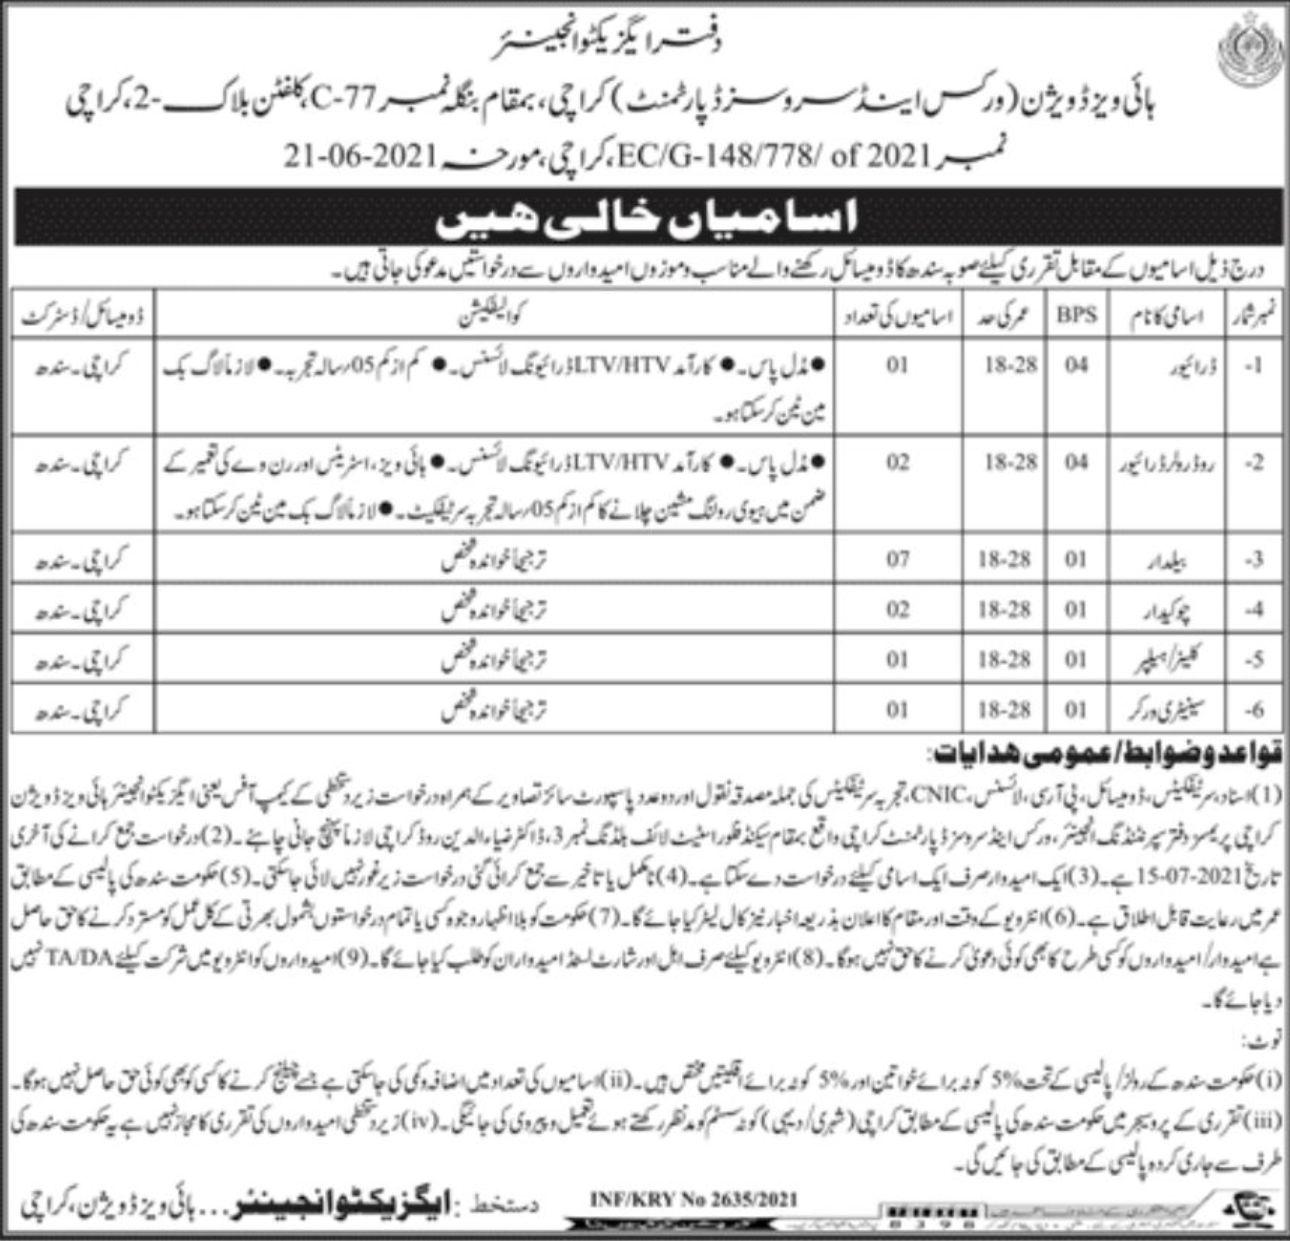 Works & Services Department Karachi Vacancies 2021 3